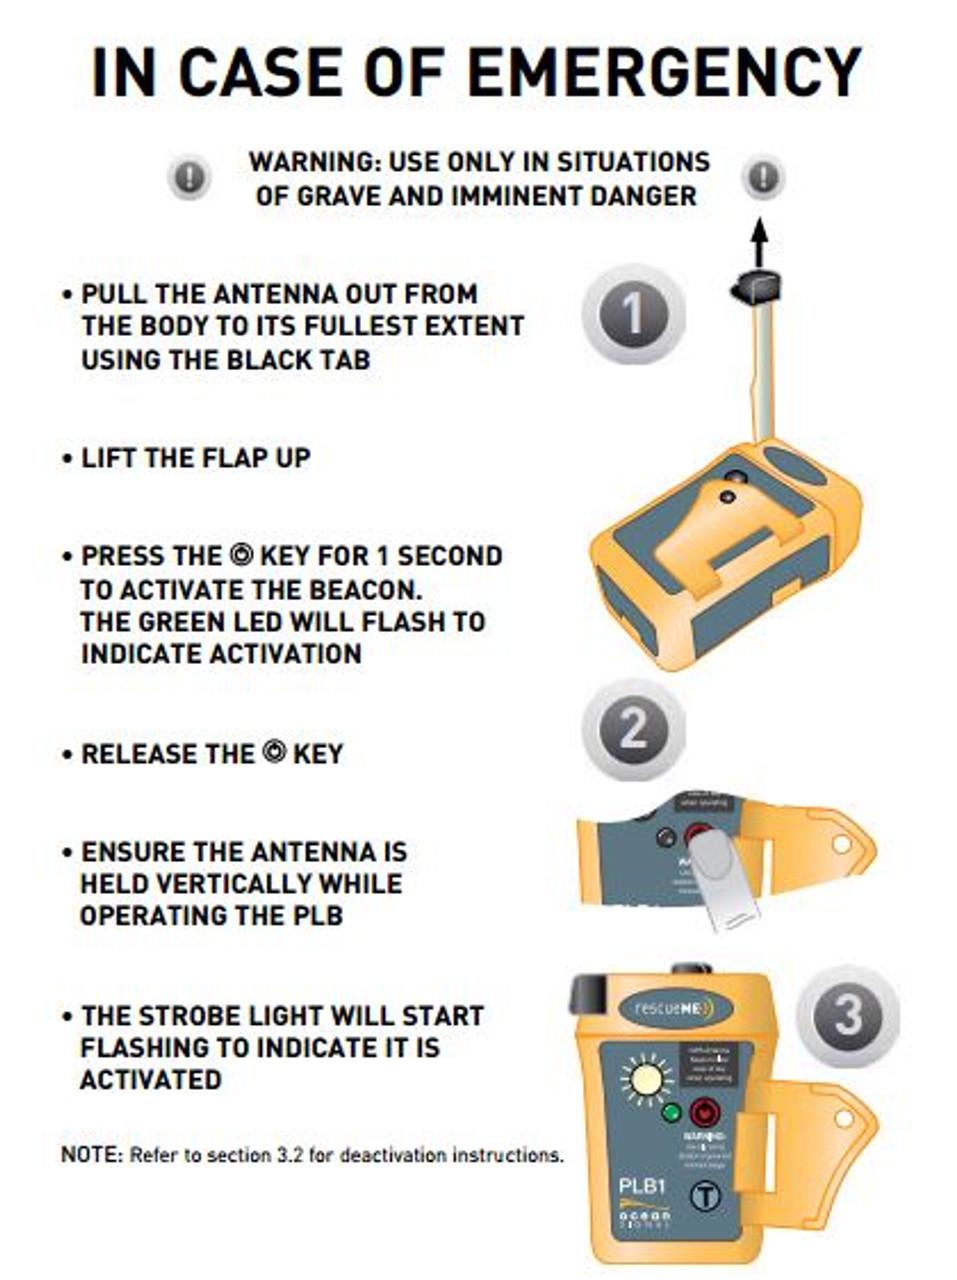 rescueMe PLB1 simple activation instructions